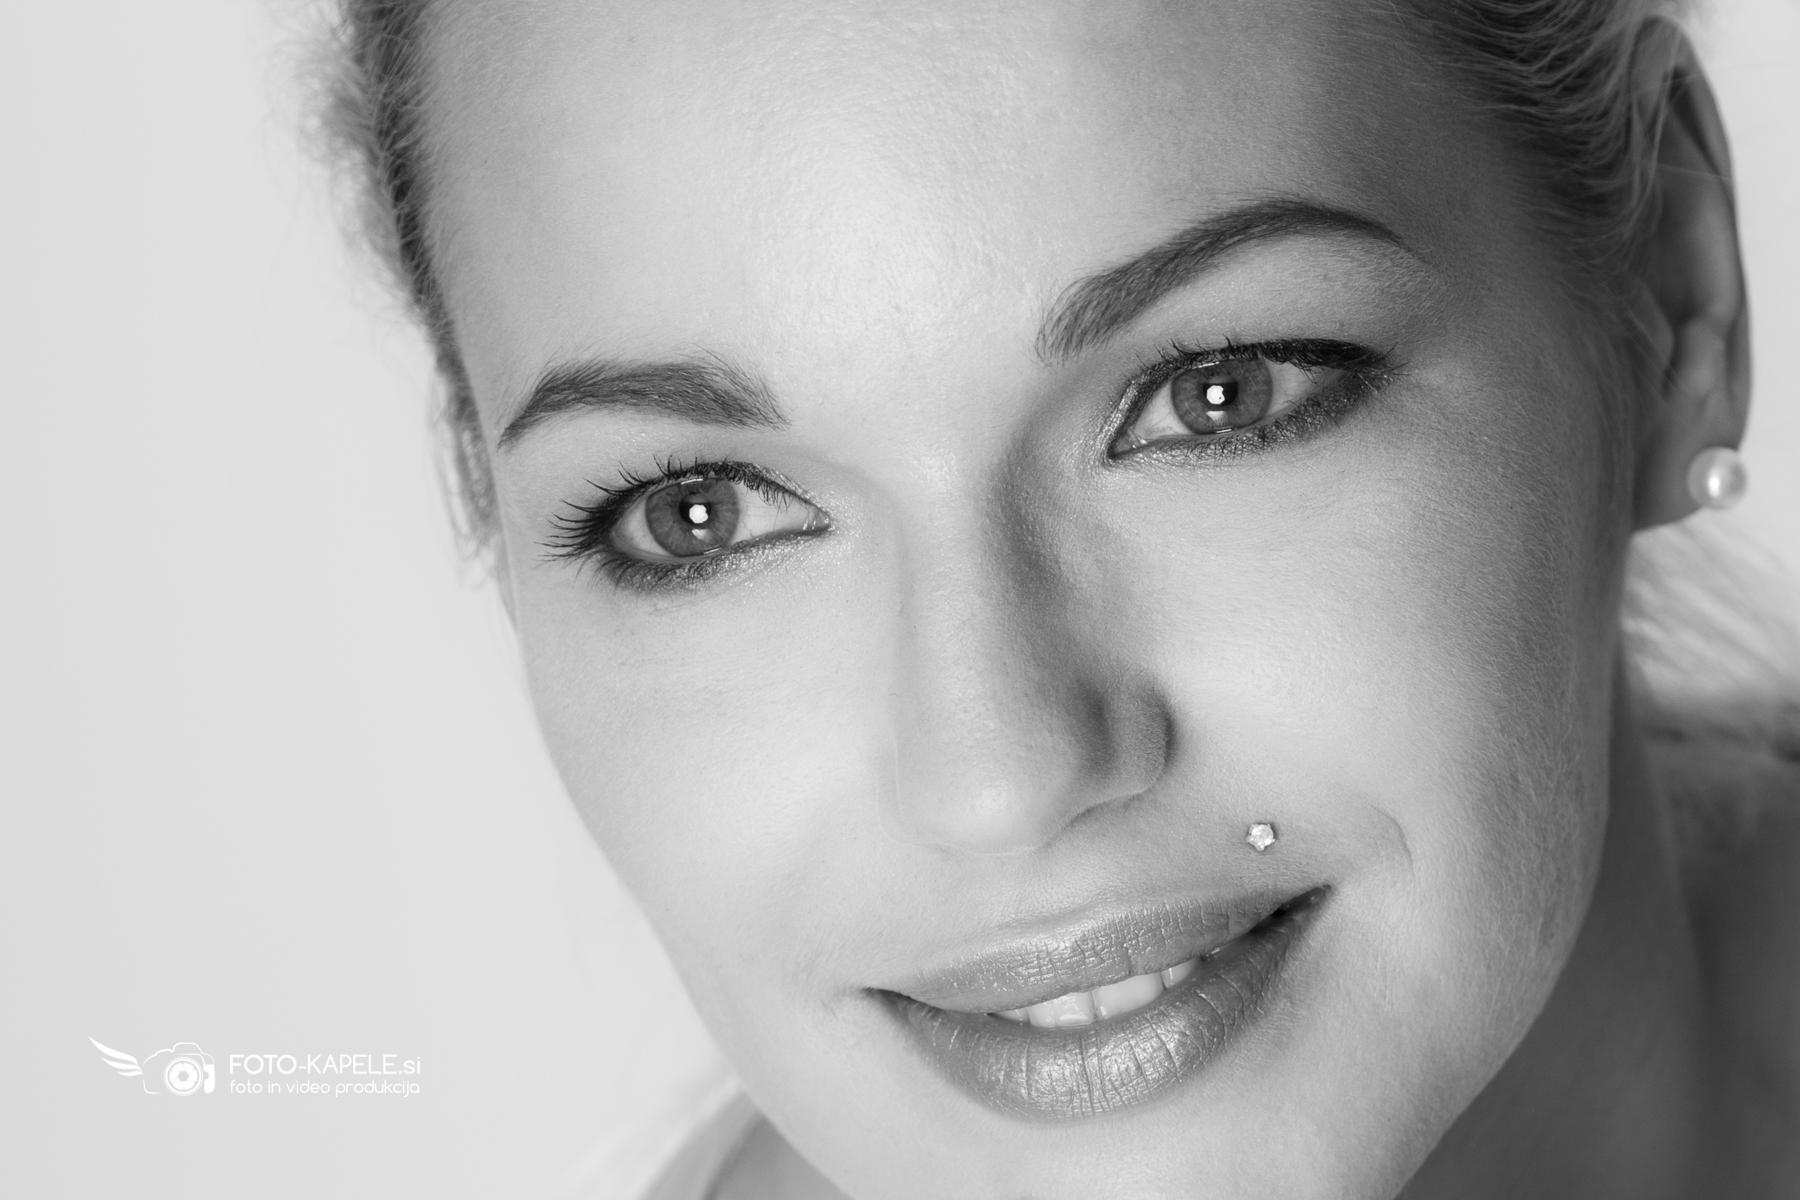 Model: Morena Potepan